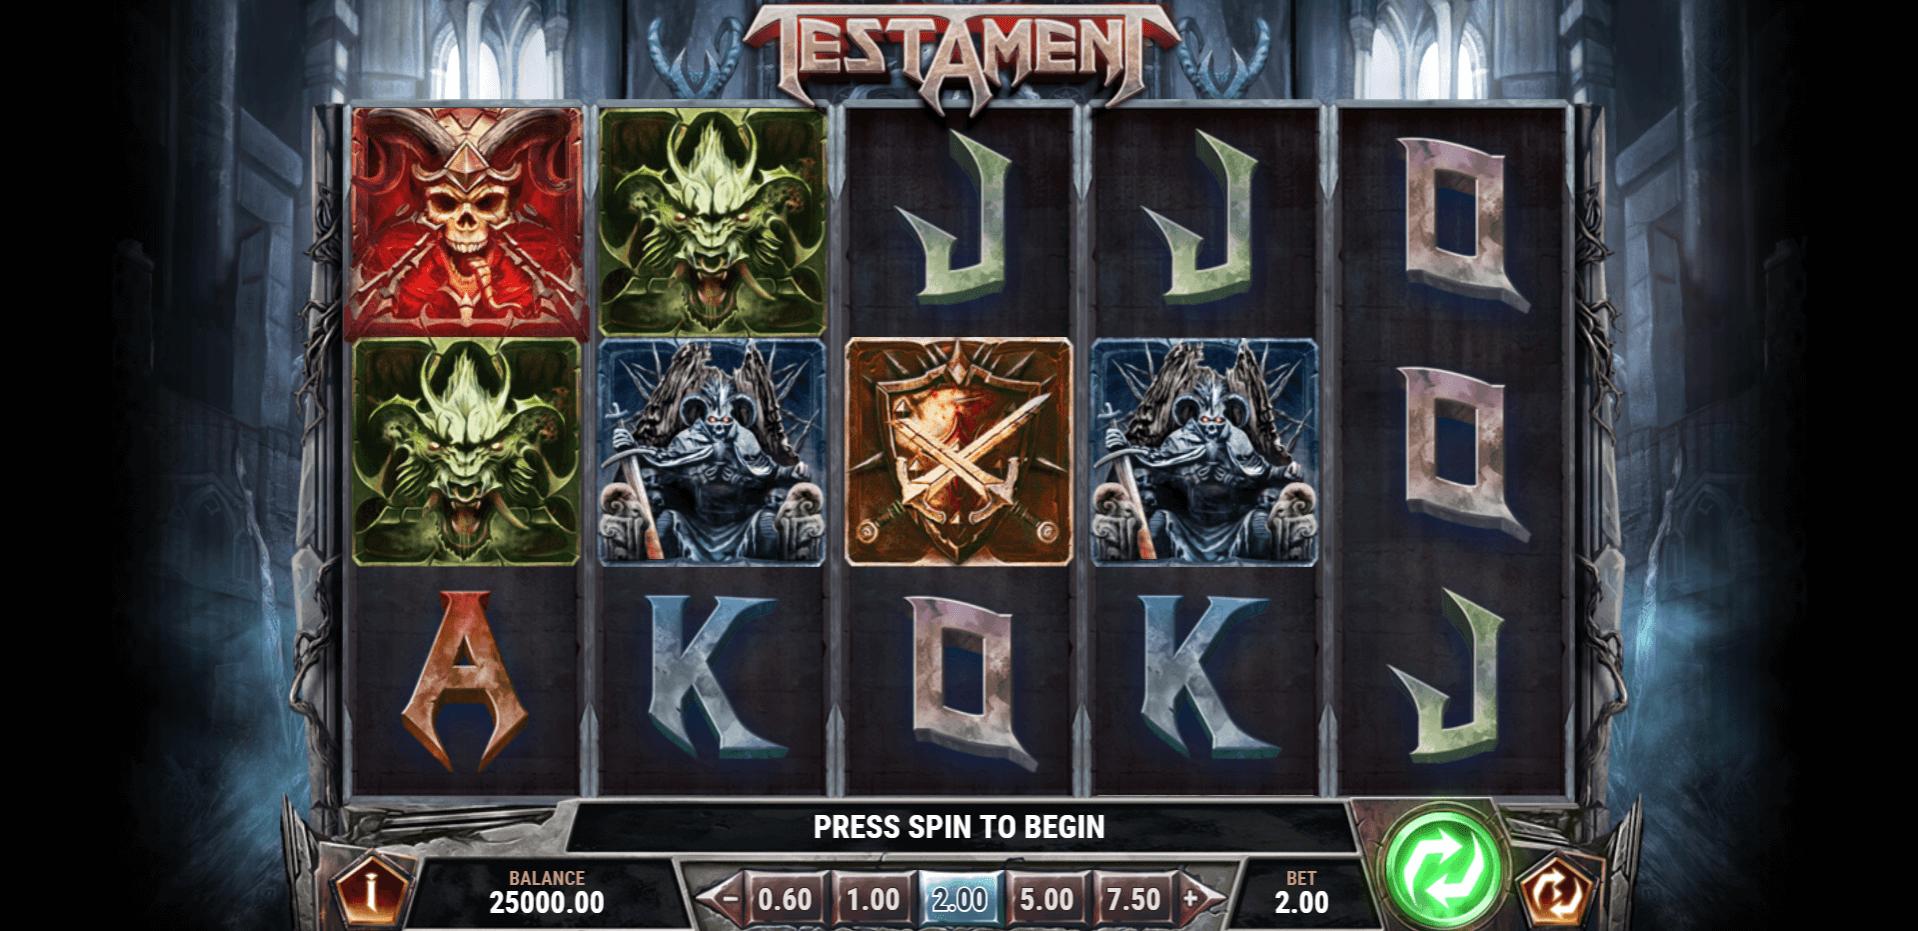 Testament slot machine screenshot